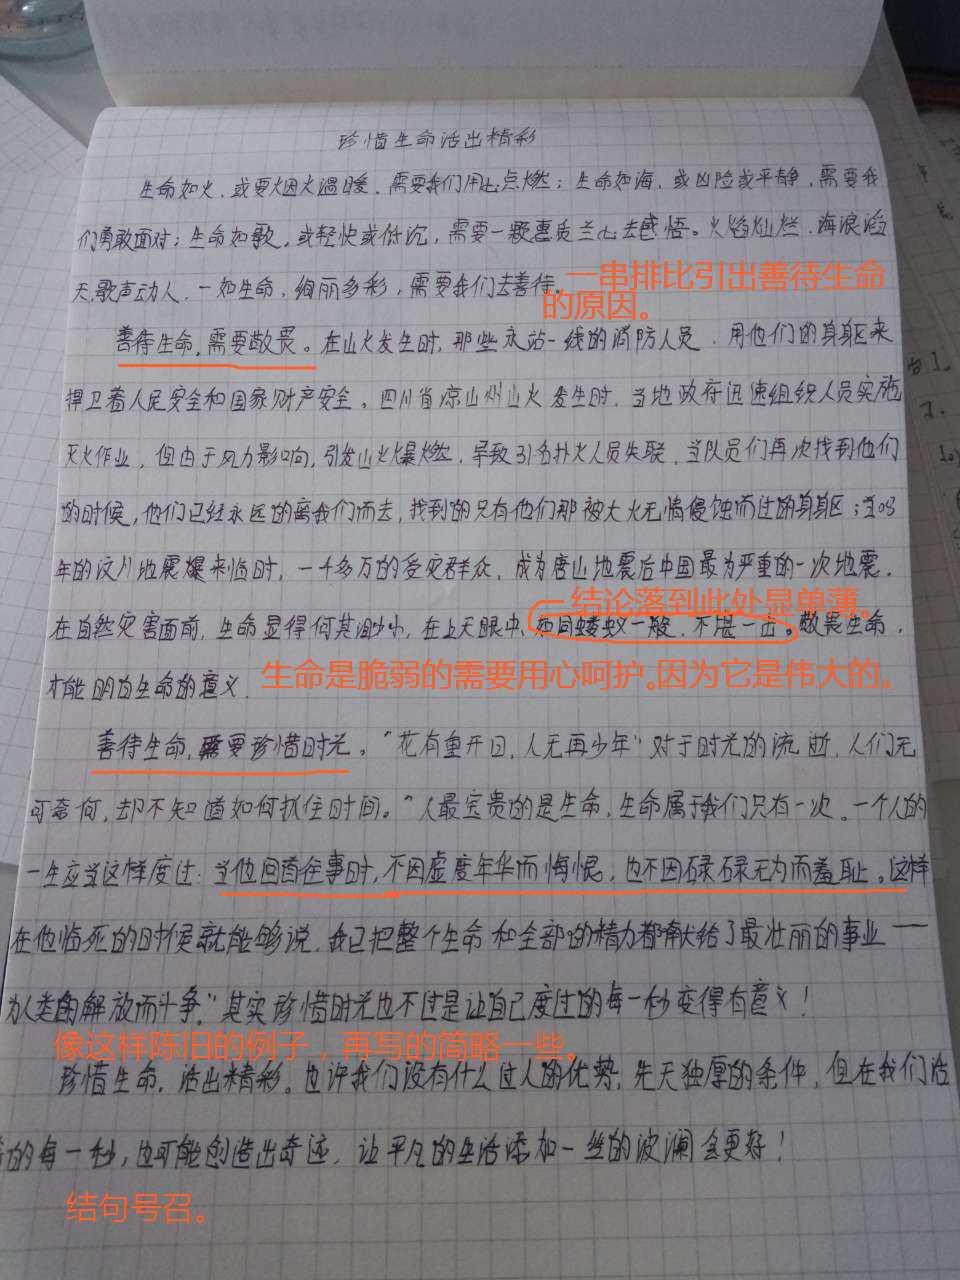 C:\Users\Administrator\Desktop\优秀作文\樊宥谷.png